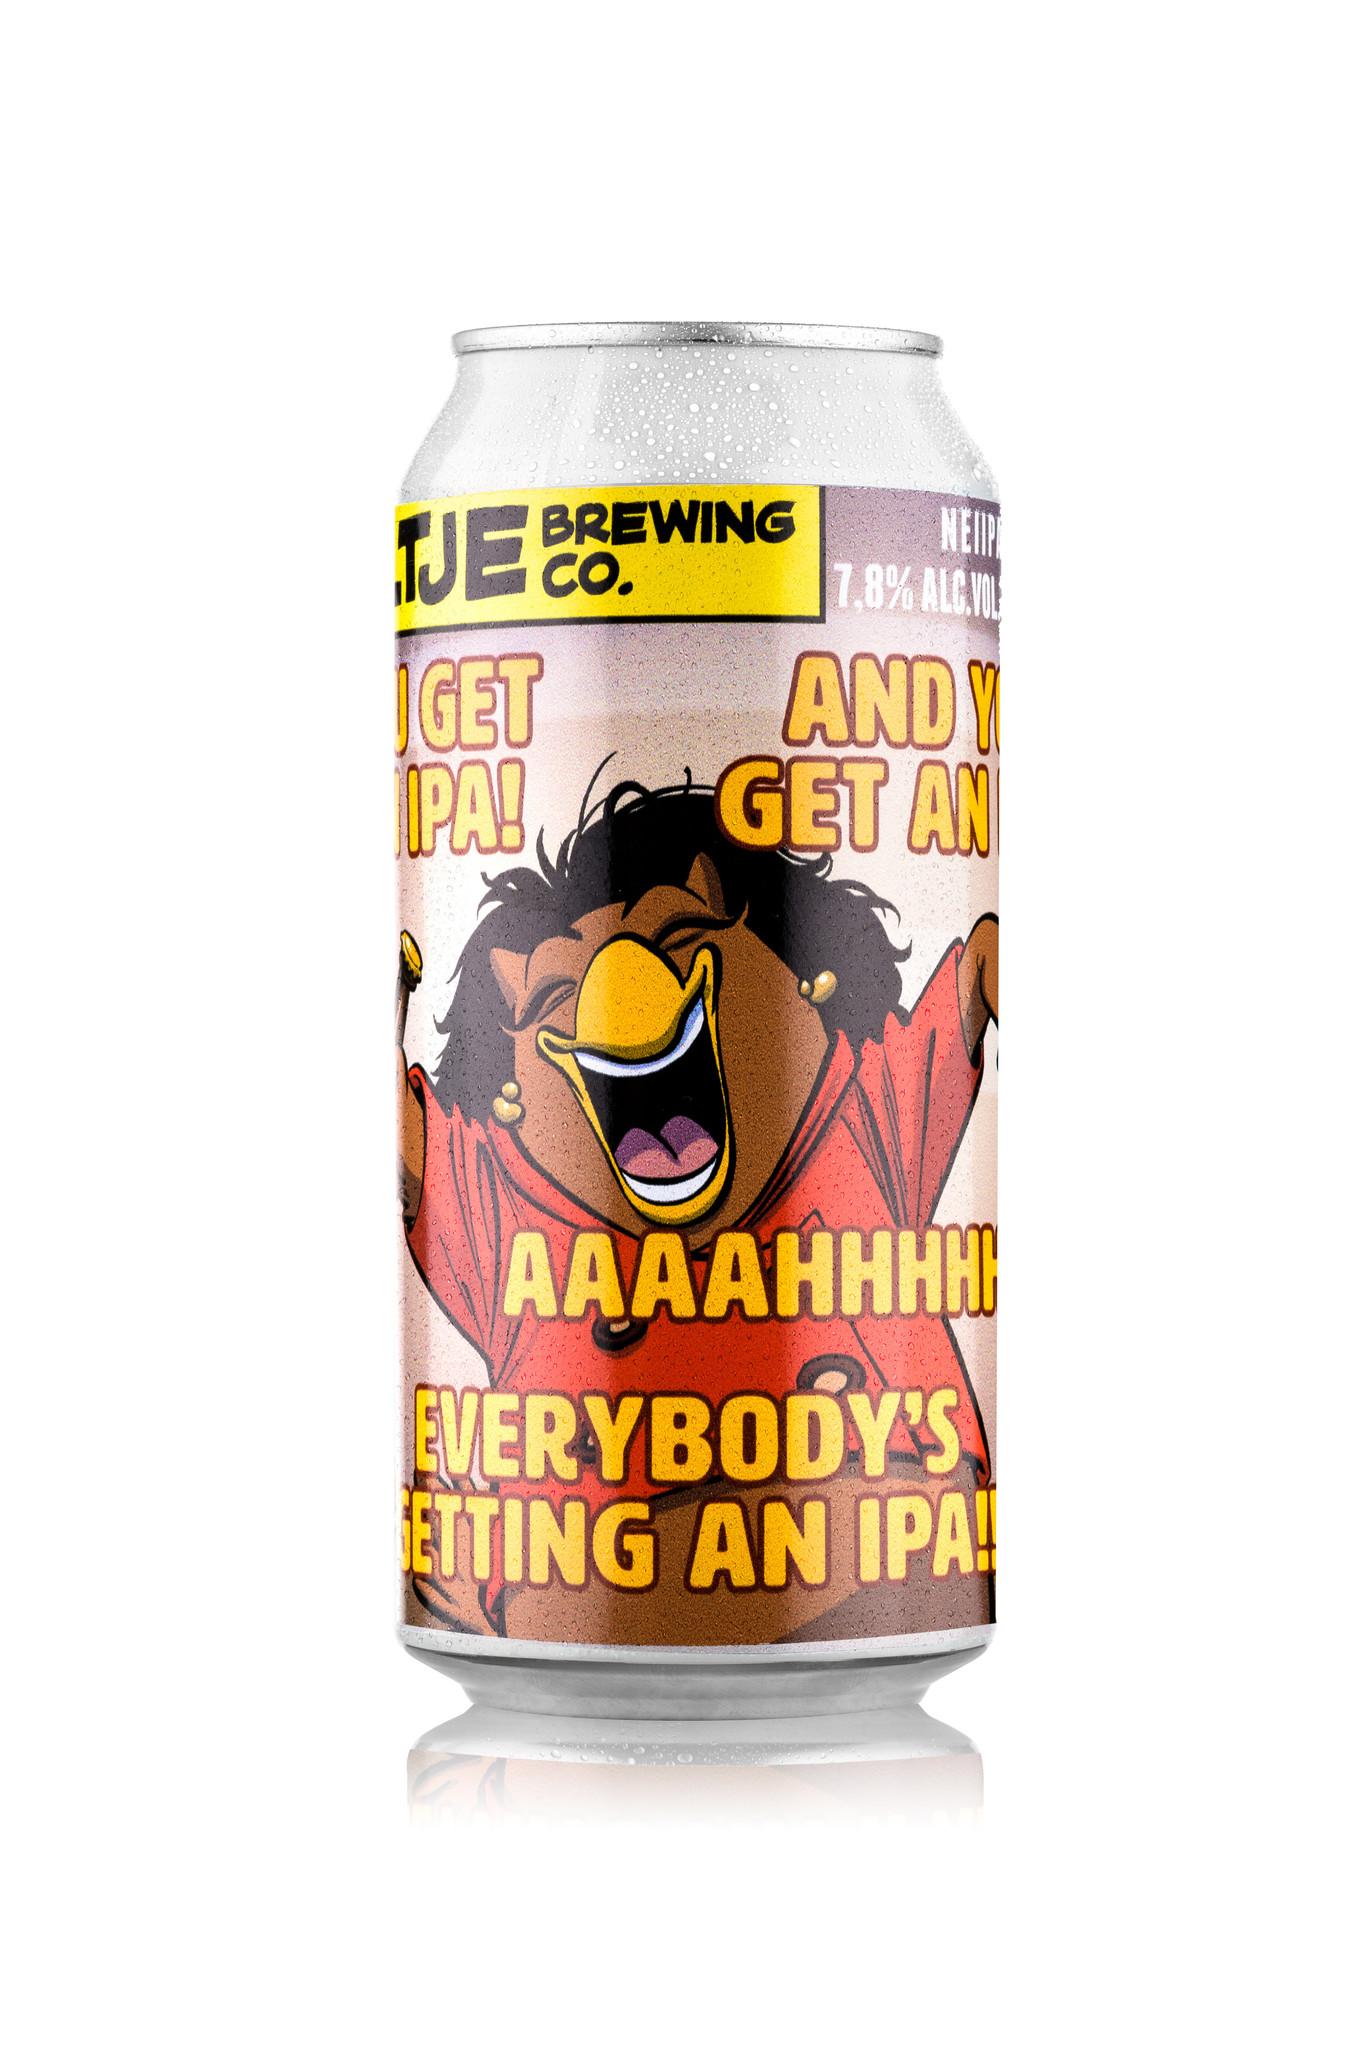 Uiltje- You Get An IPA! And You Get An IPA! Everybody's getting an IPA!- Blik